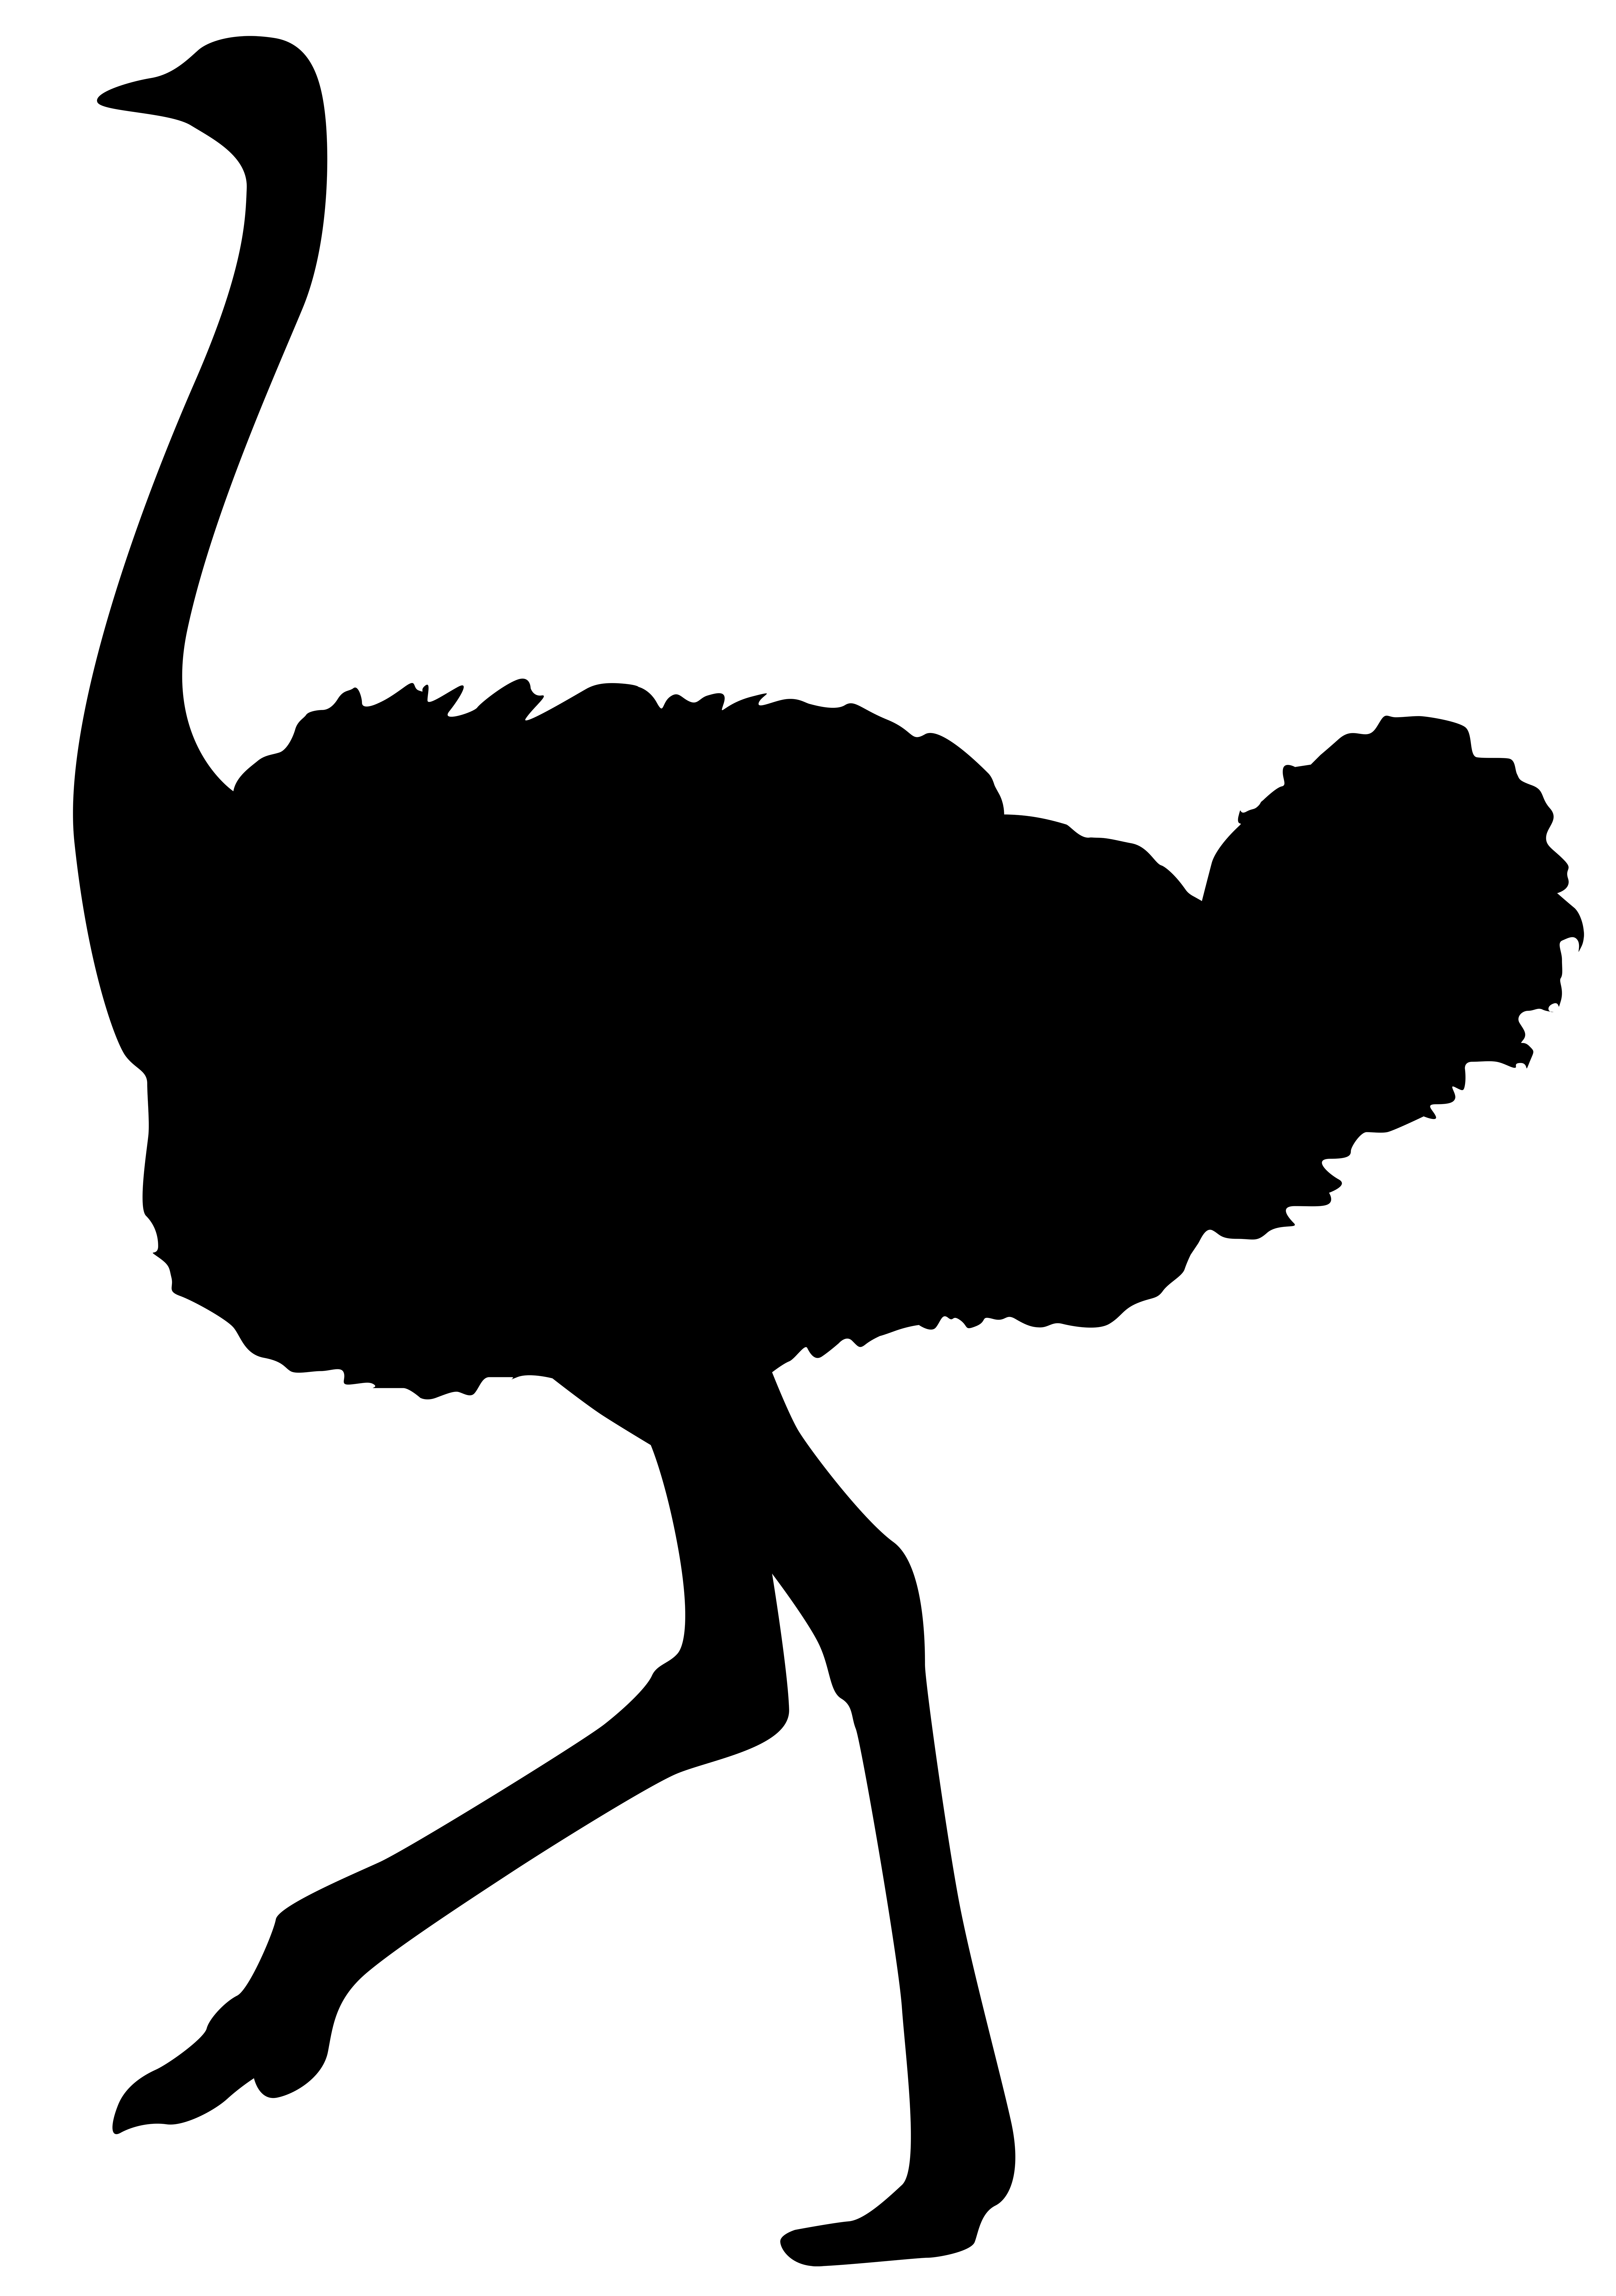 5629x8000 Ostrich Silhouette Png Transparent Clip Art Imageu200b Gallery